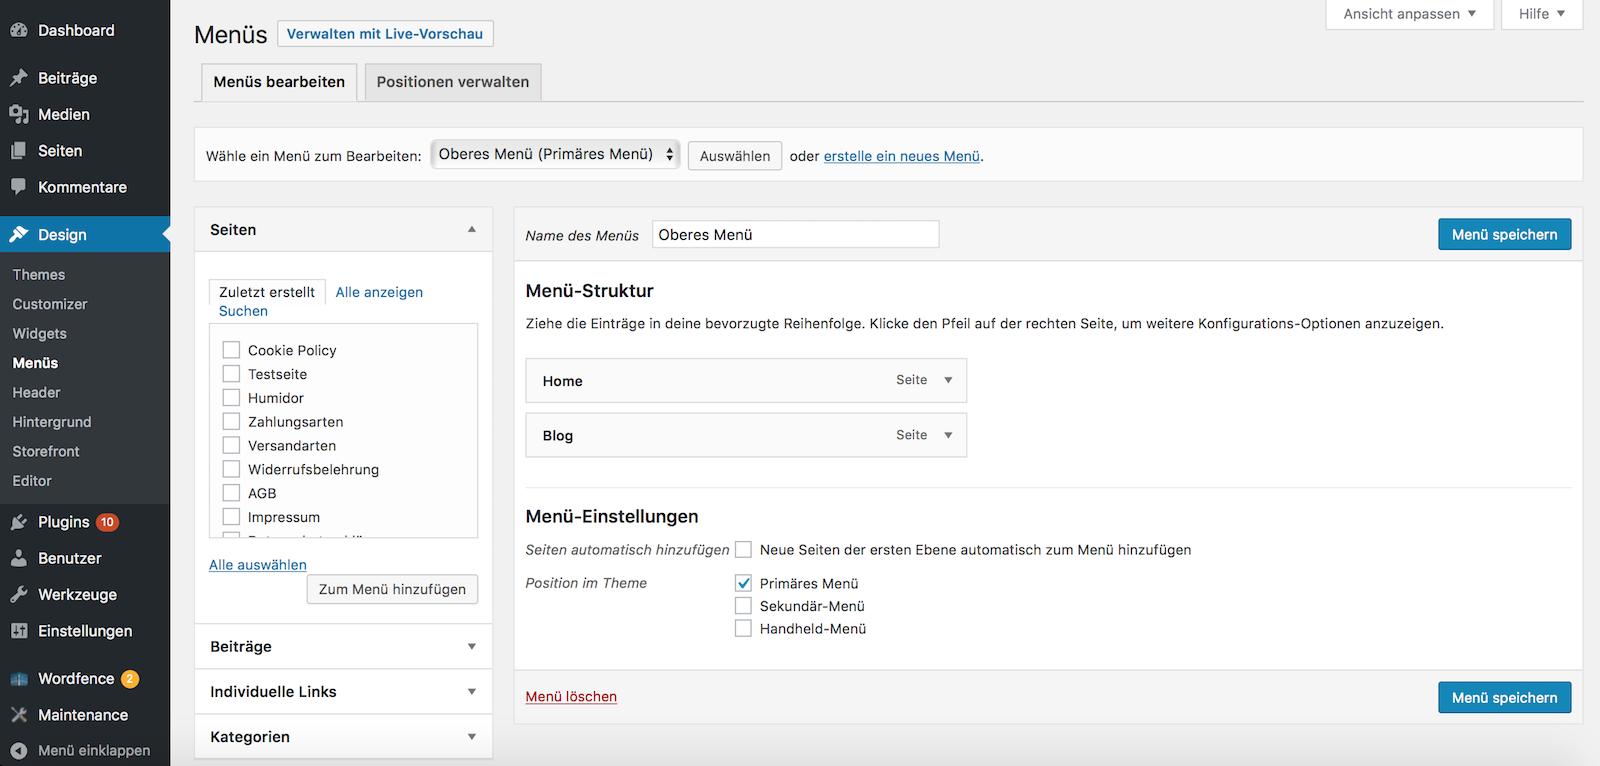 WordPress Menü anlegen und bearbeiten